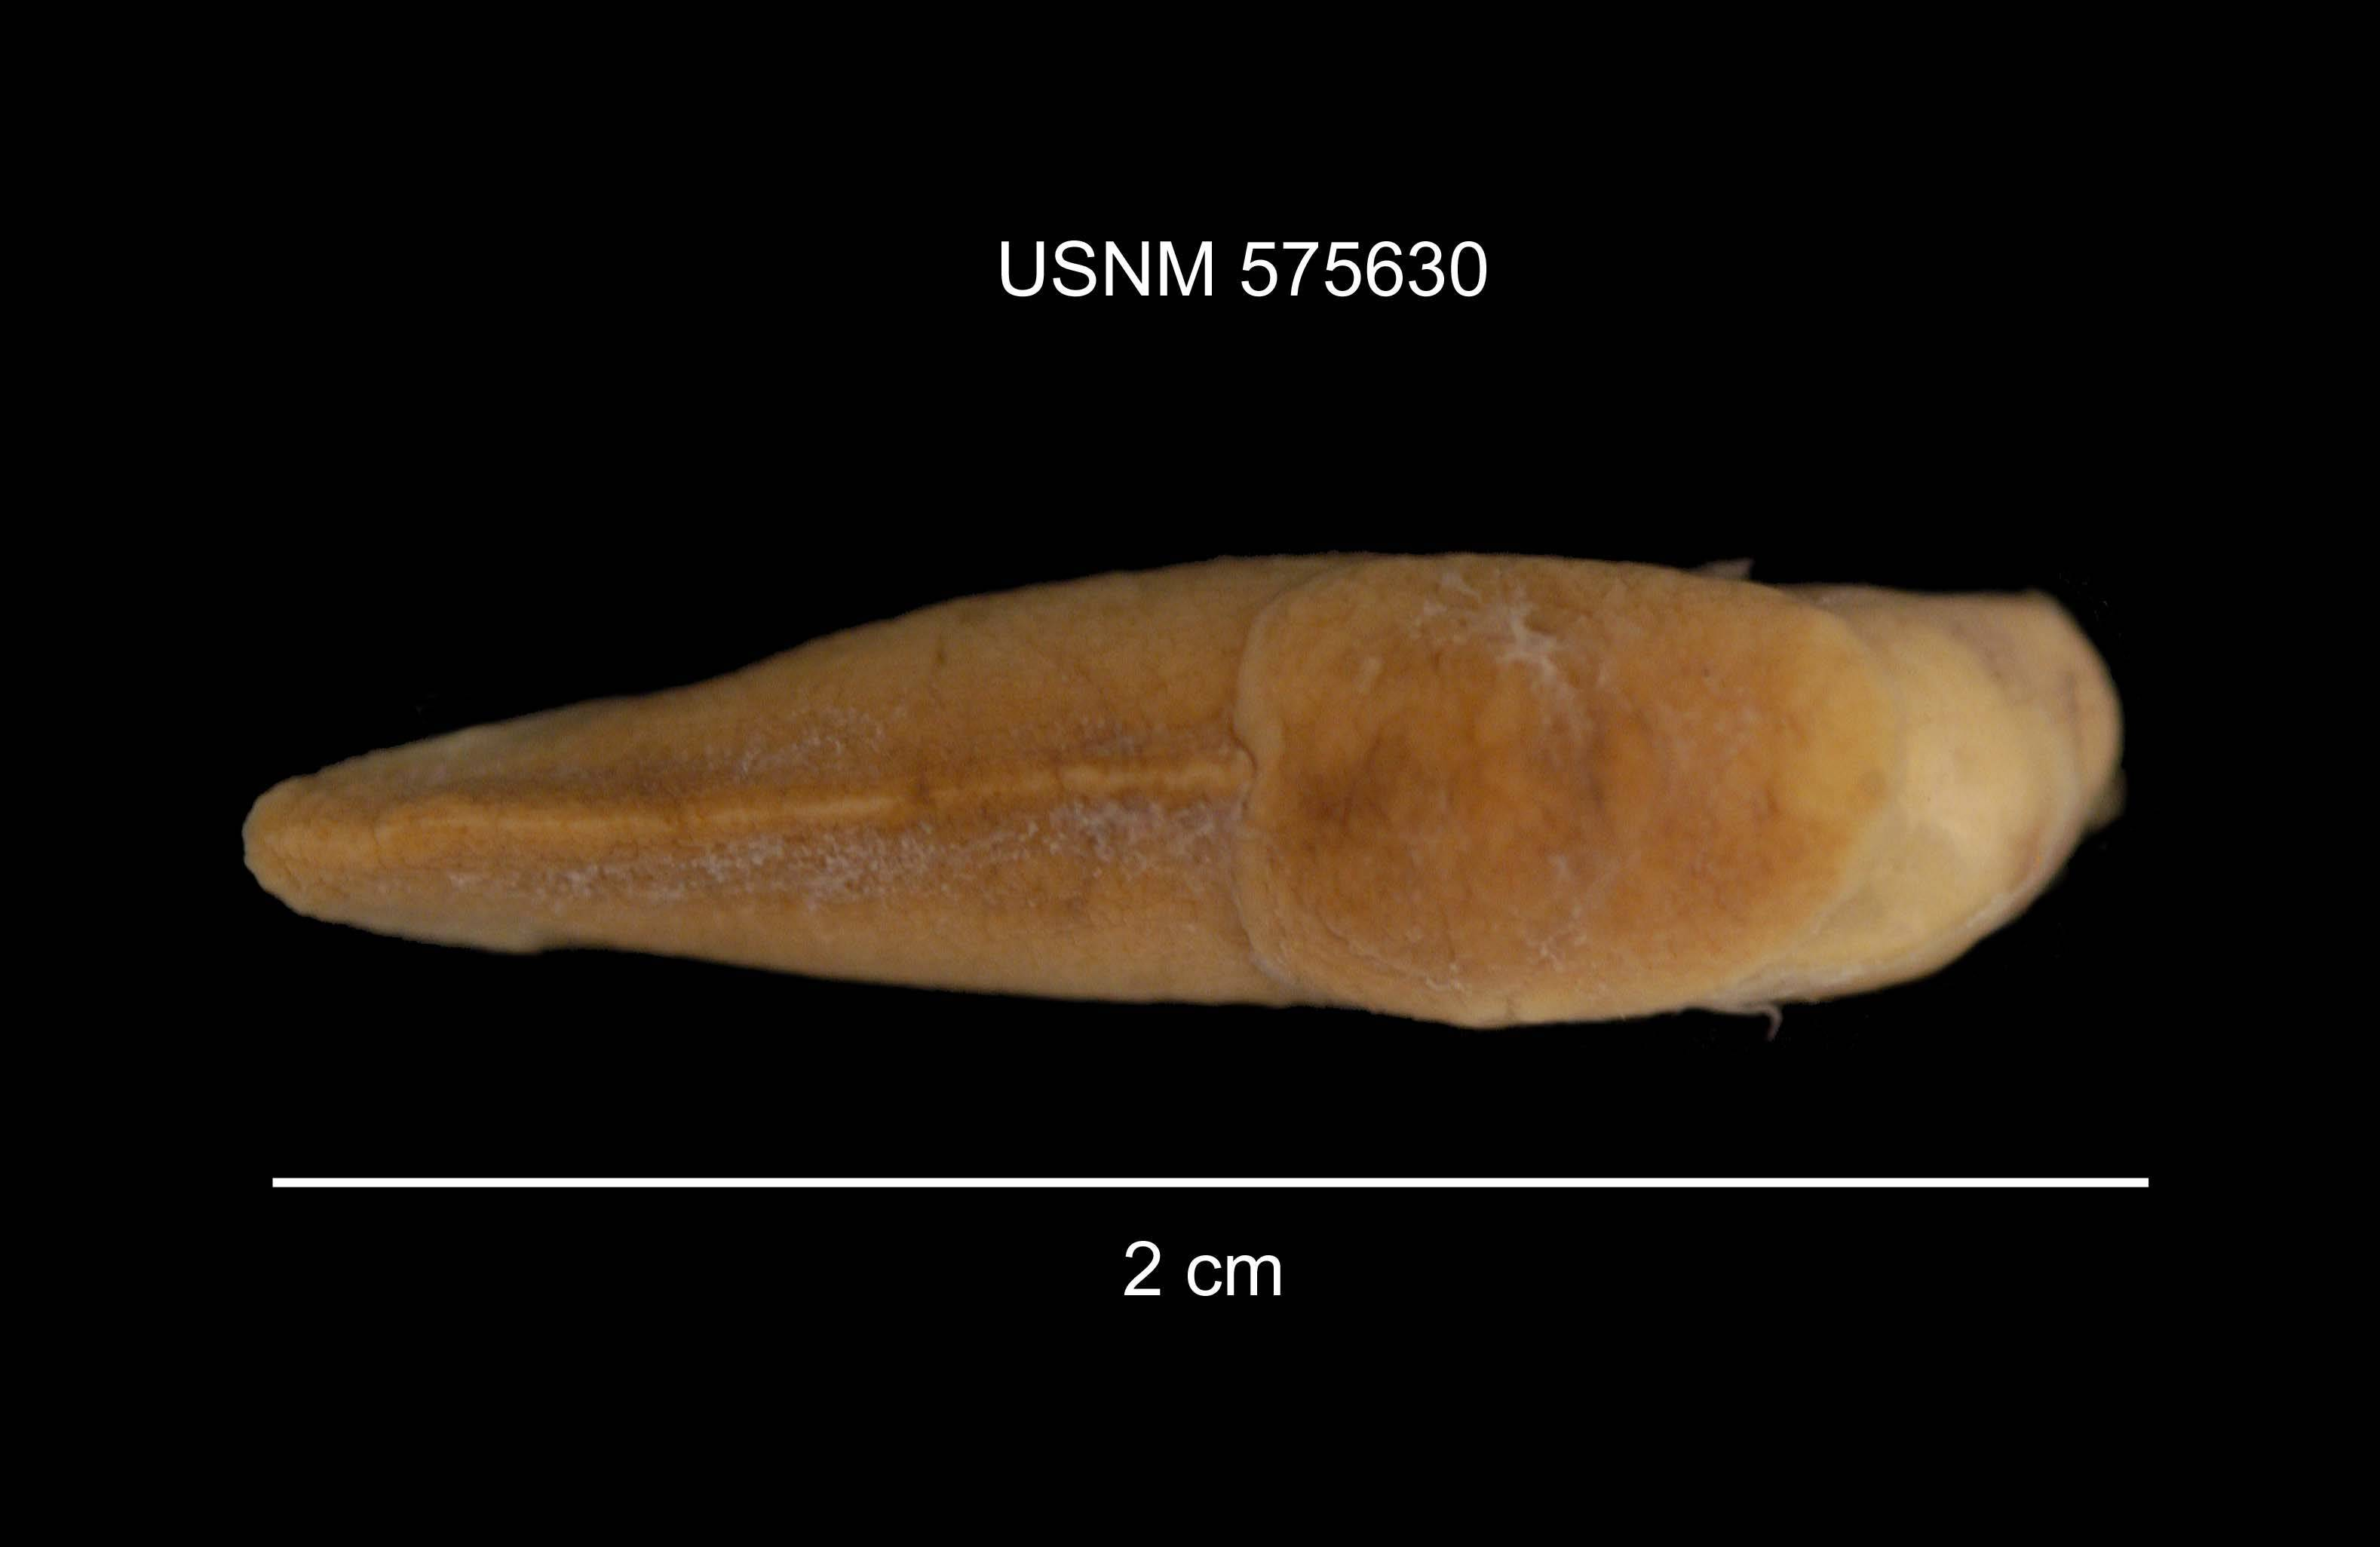 Image of Greenhouse slug